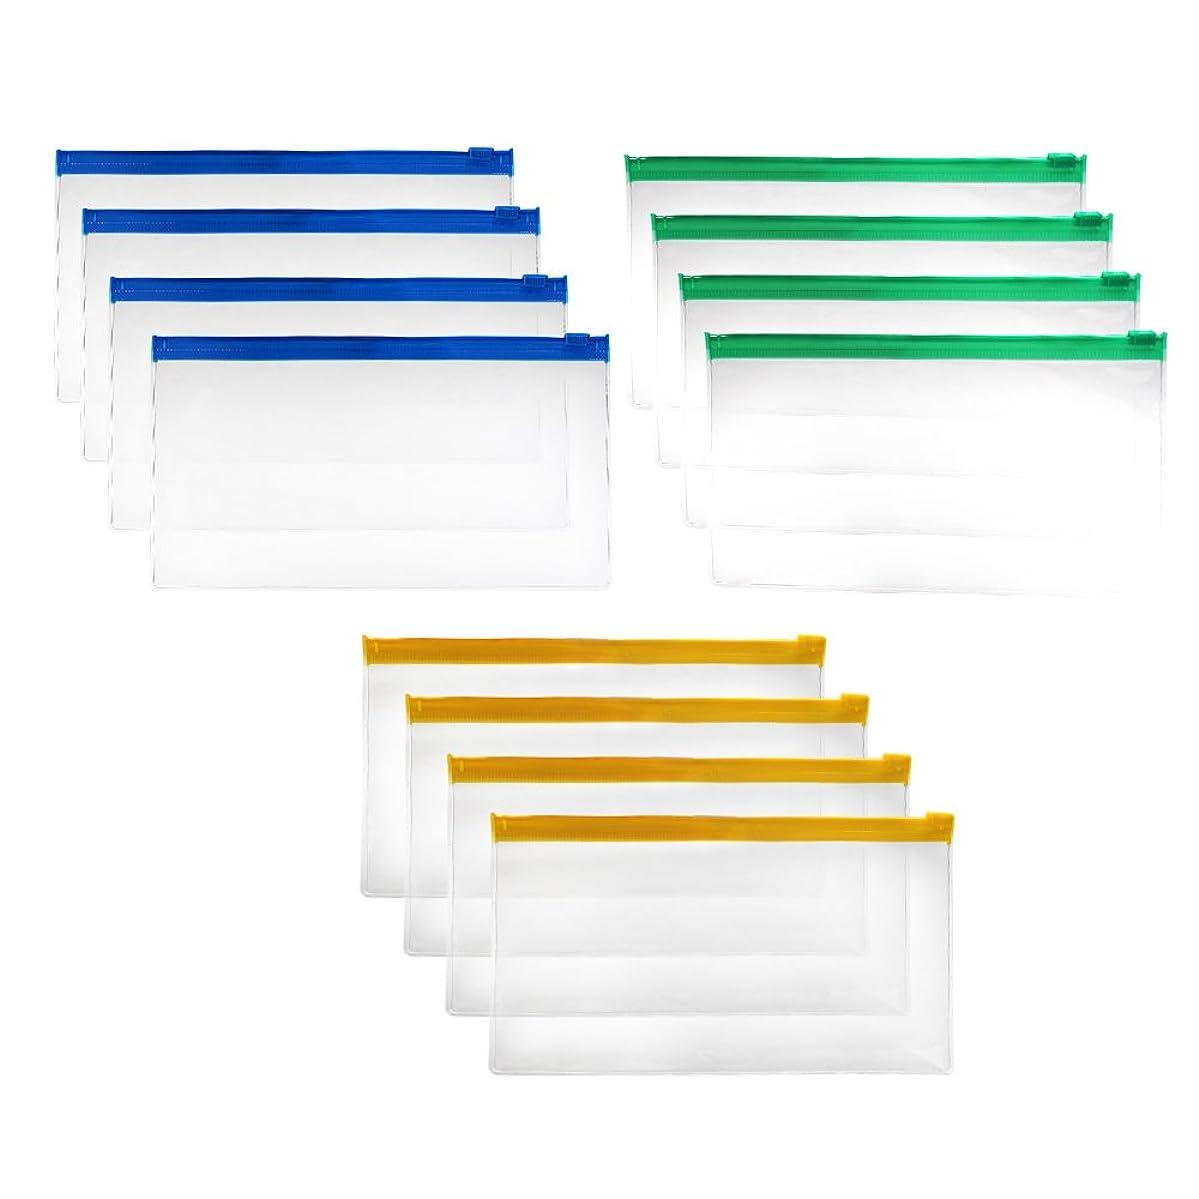 Md trade 12pcs 7-1/2 x 4 inches Clear Color Waterproof PVC Plastic Soft Zipper Invoice pouches Bill Bag Pencil Pouch Pen Bag (Random Color)